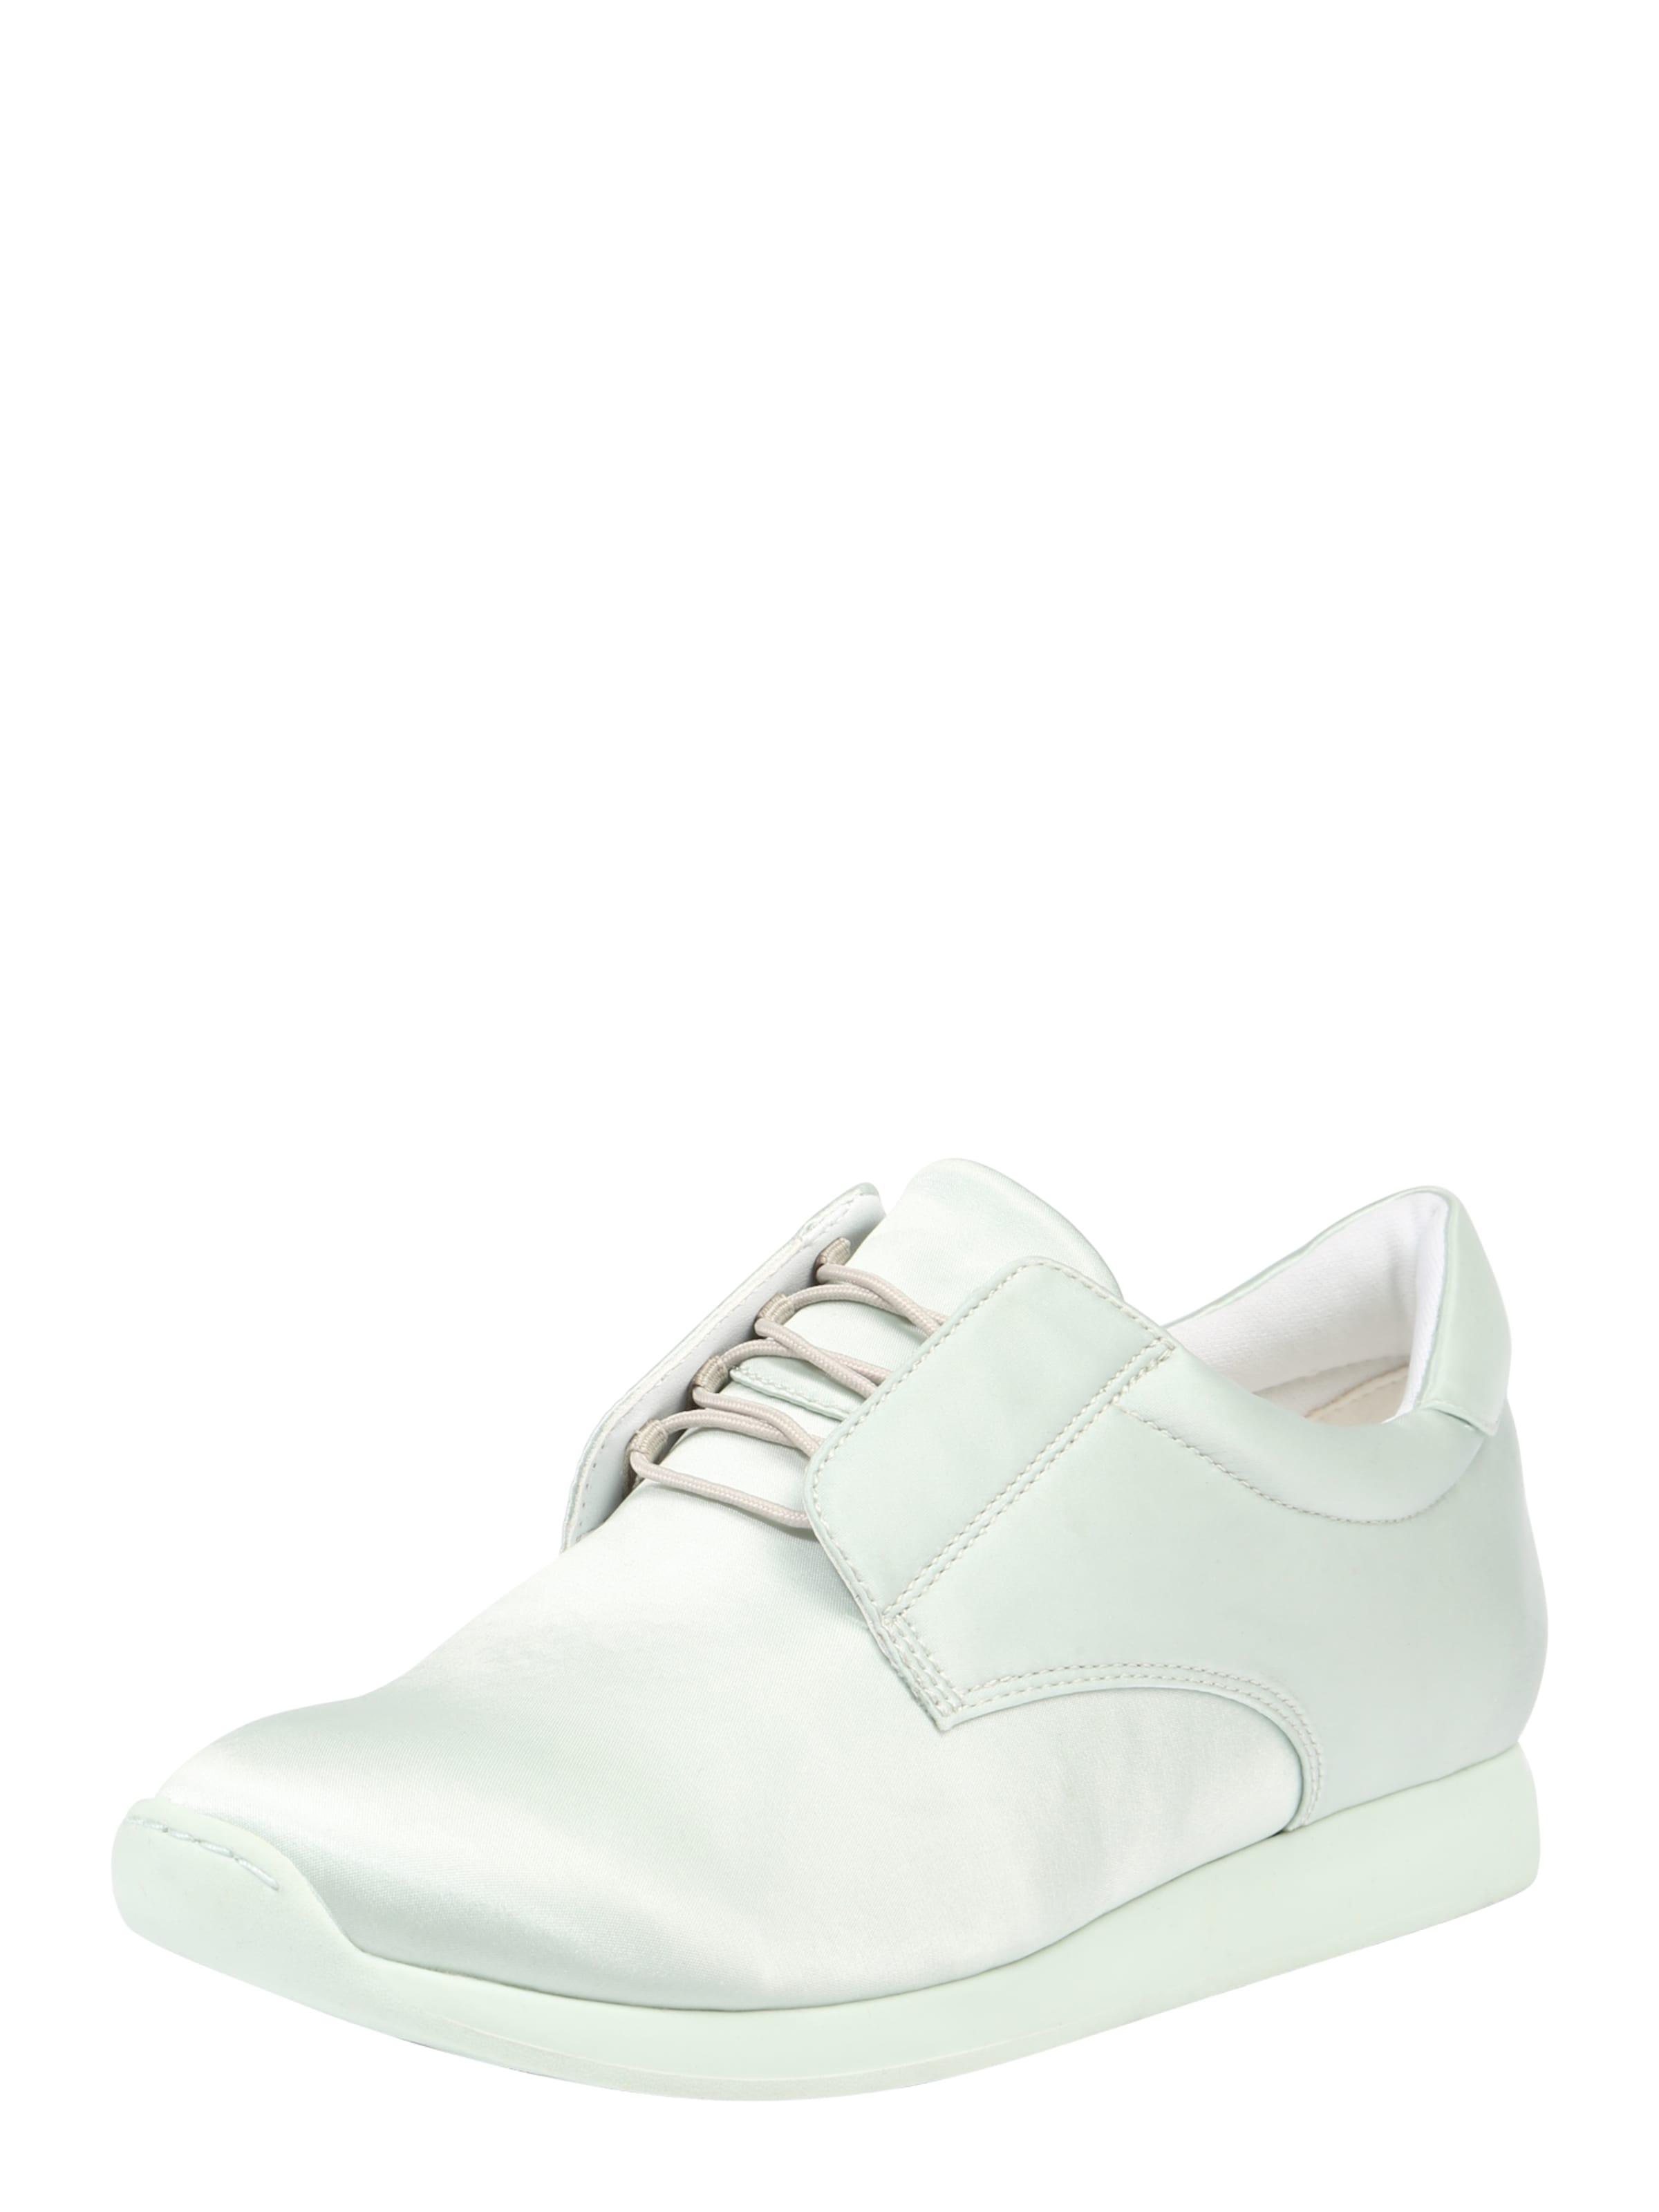 VAGABOND SHOEMAKERS Sneaker  Kasai